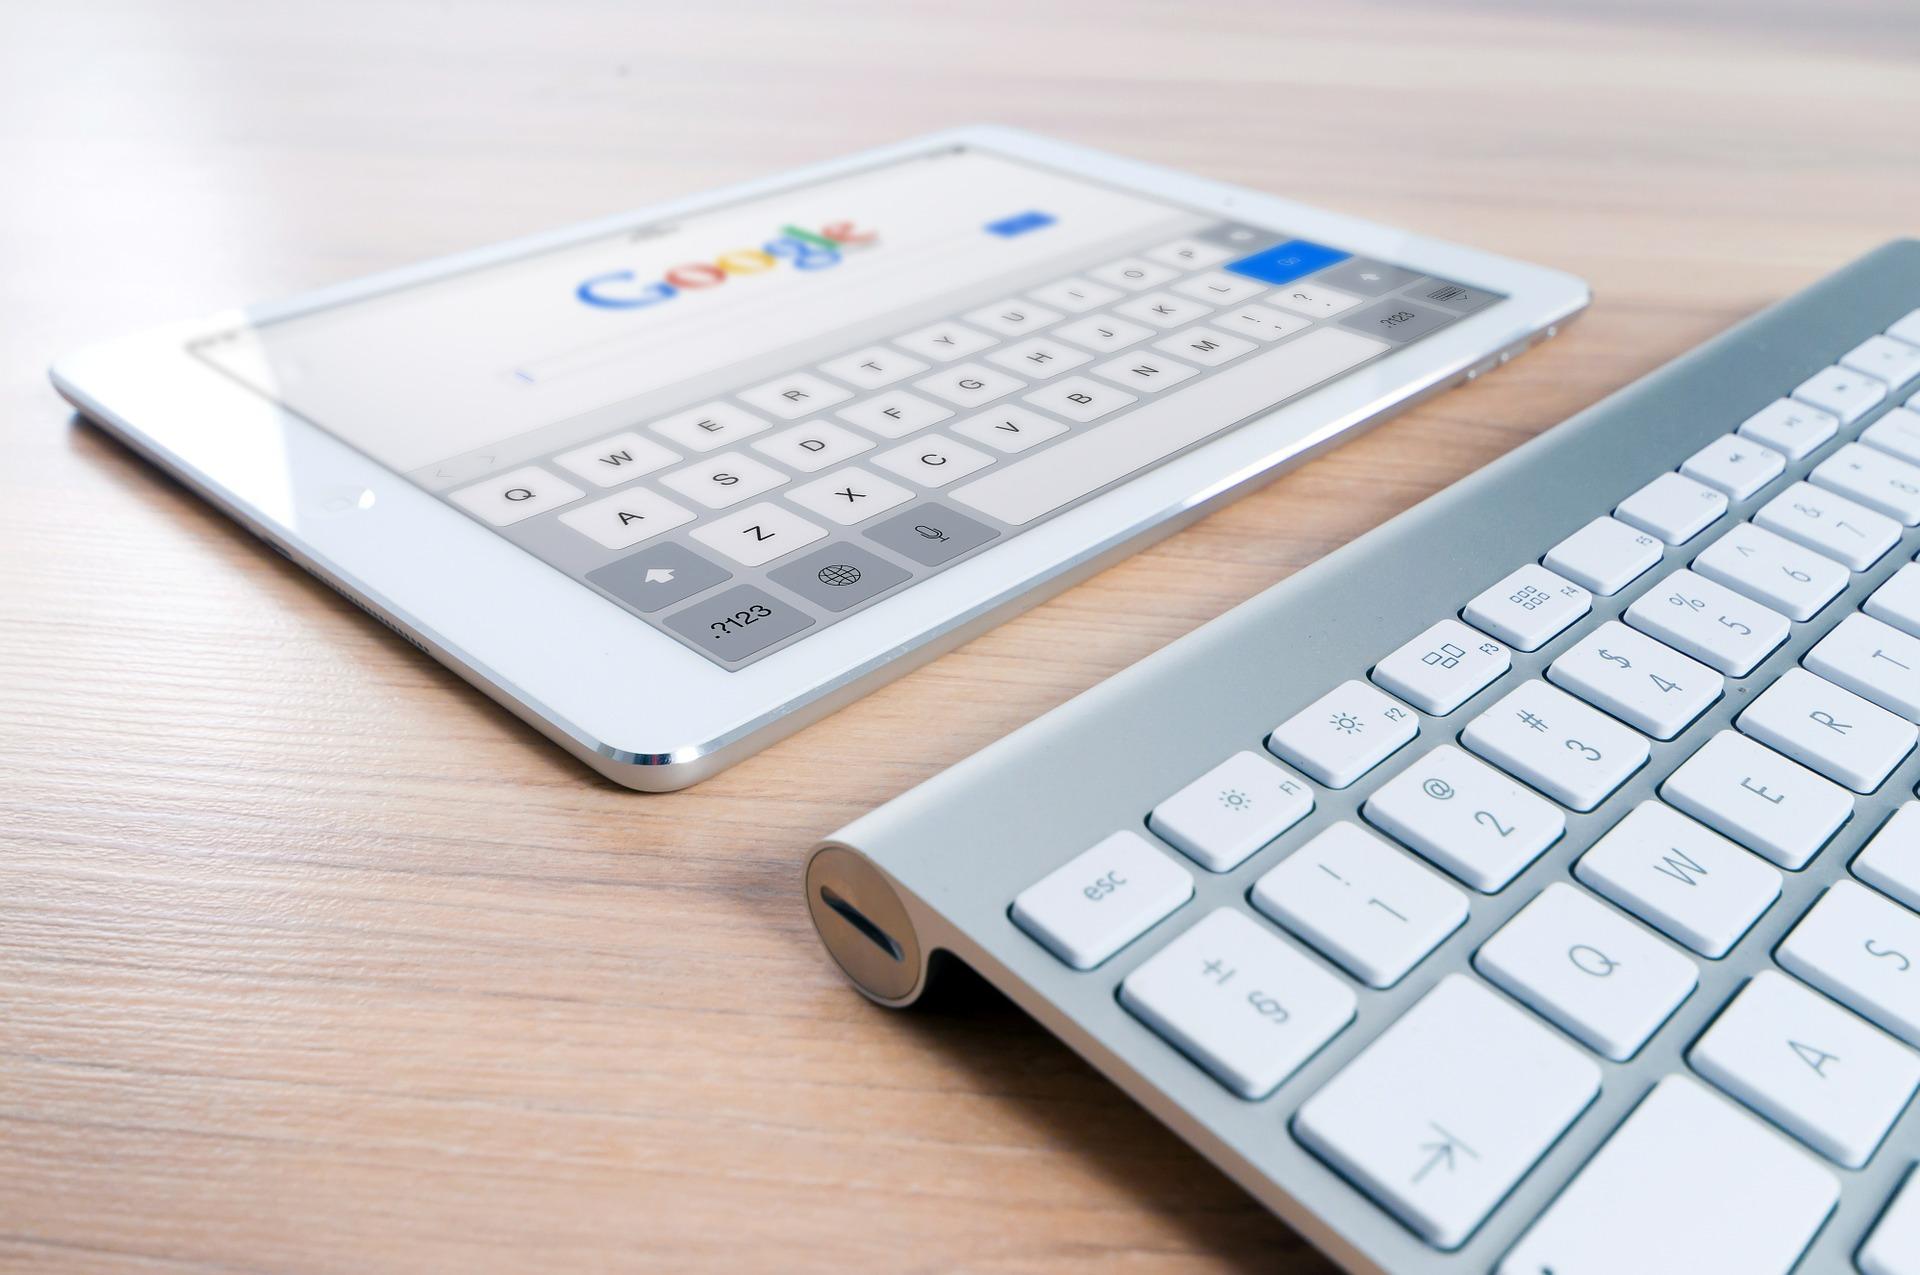 ipad a klávesnice